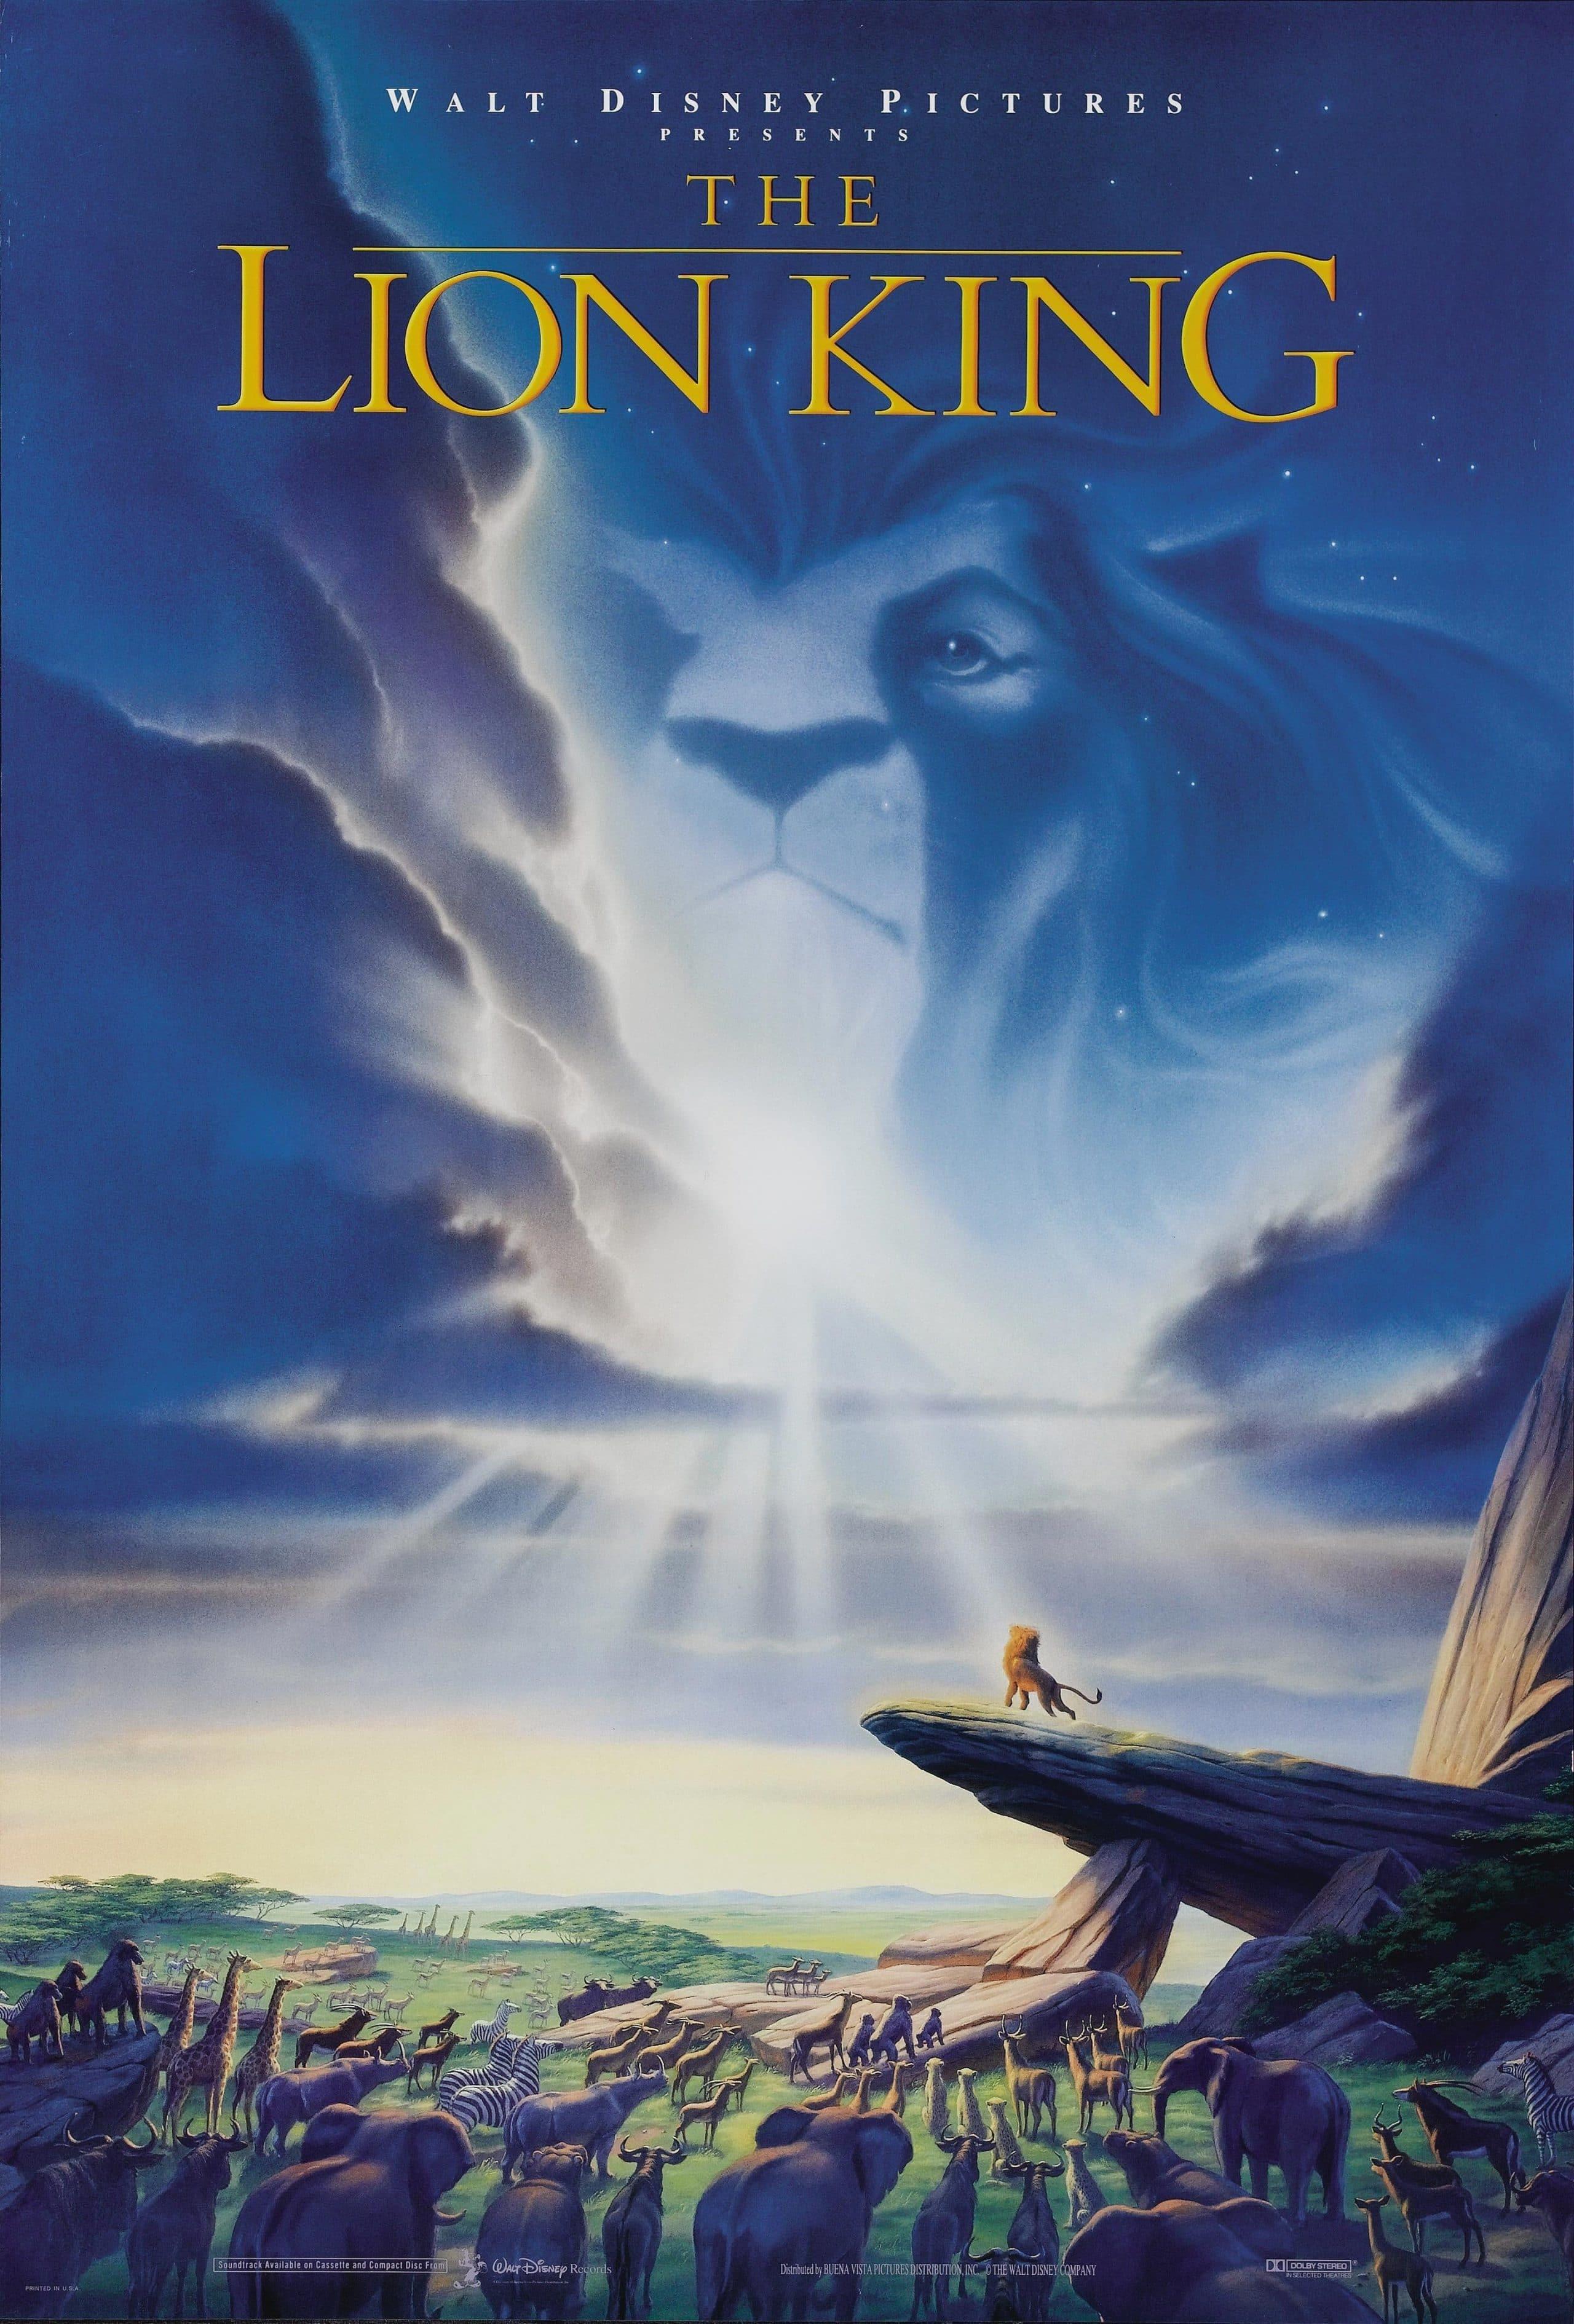 the lion king poster 1 1994 high quality HD printable wallpapers pride land simba musafa on the rock